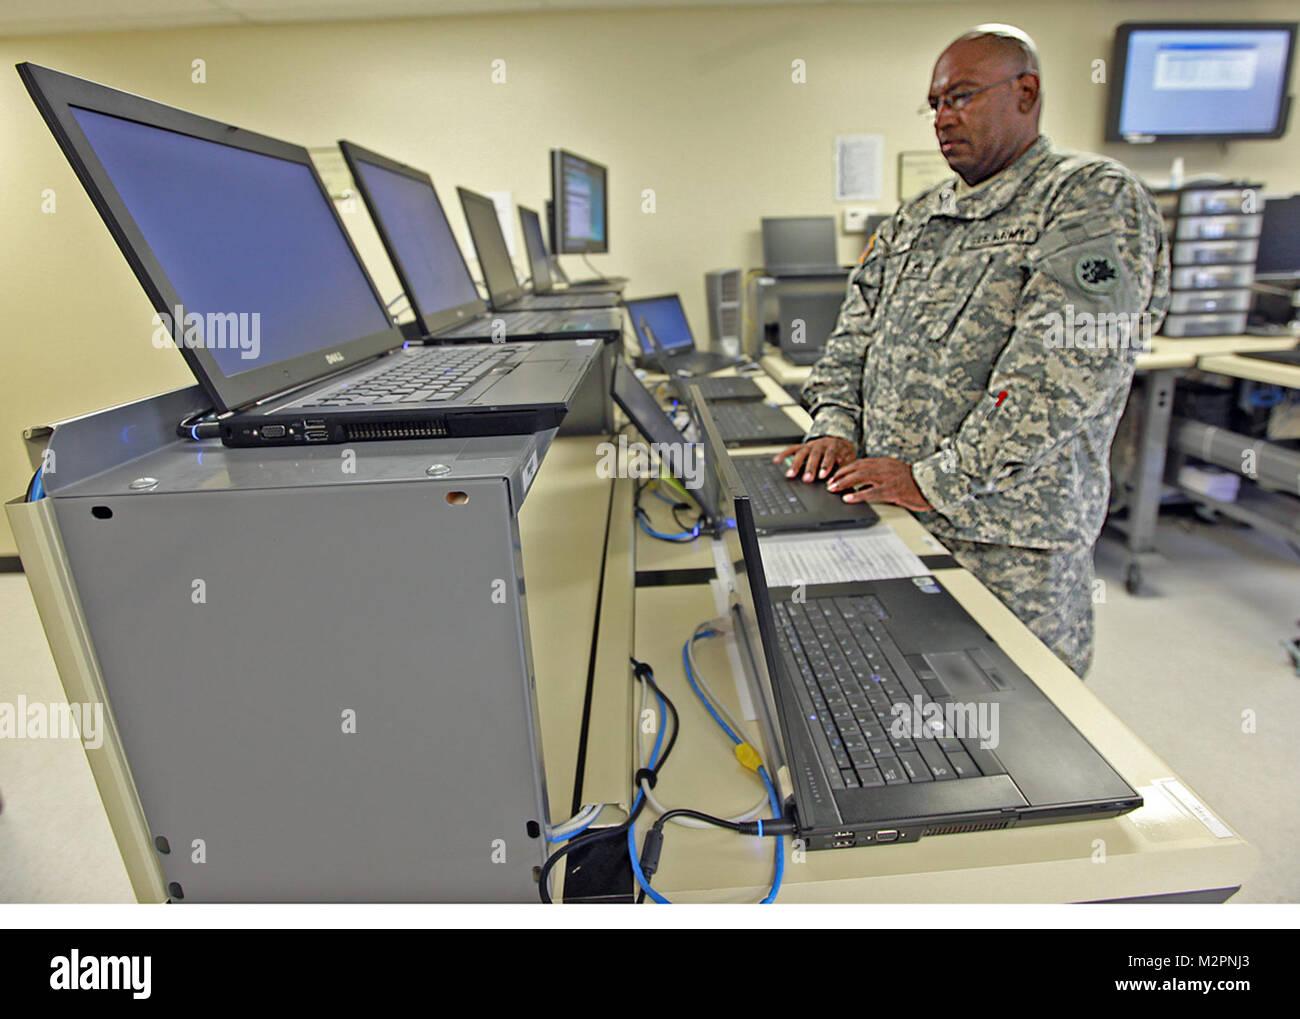 National Guard computer imaging technician by Georgia National Guard - Stock Image